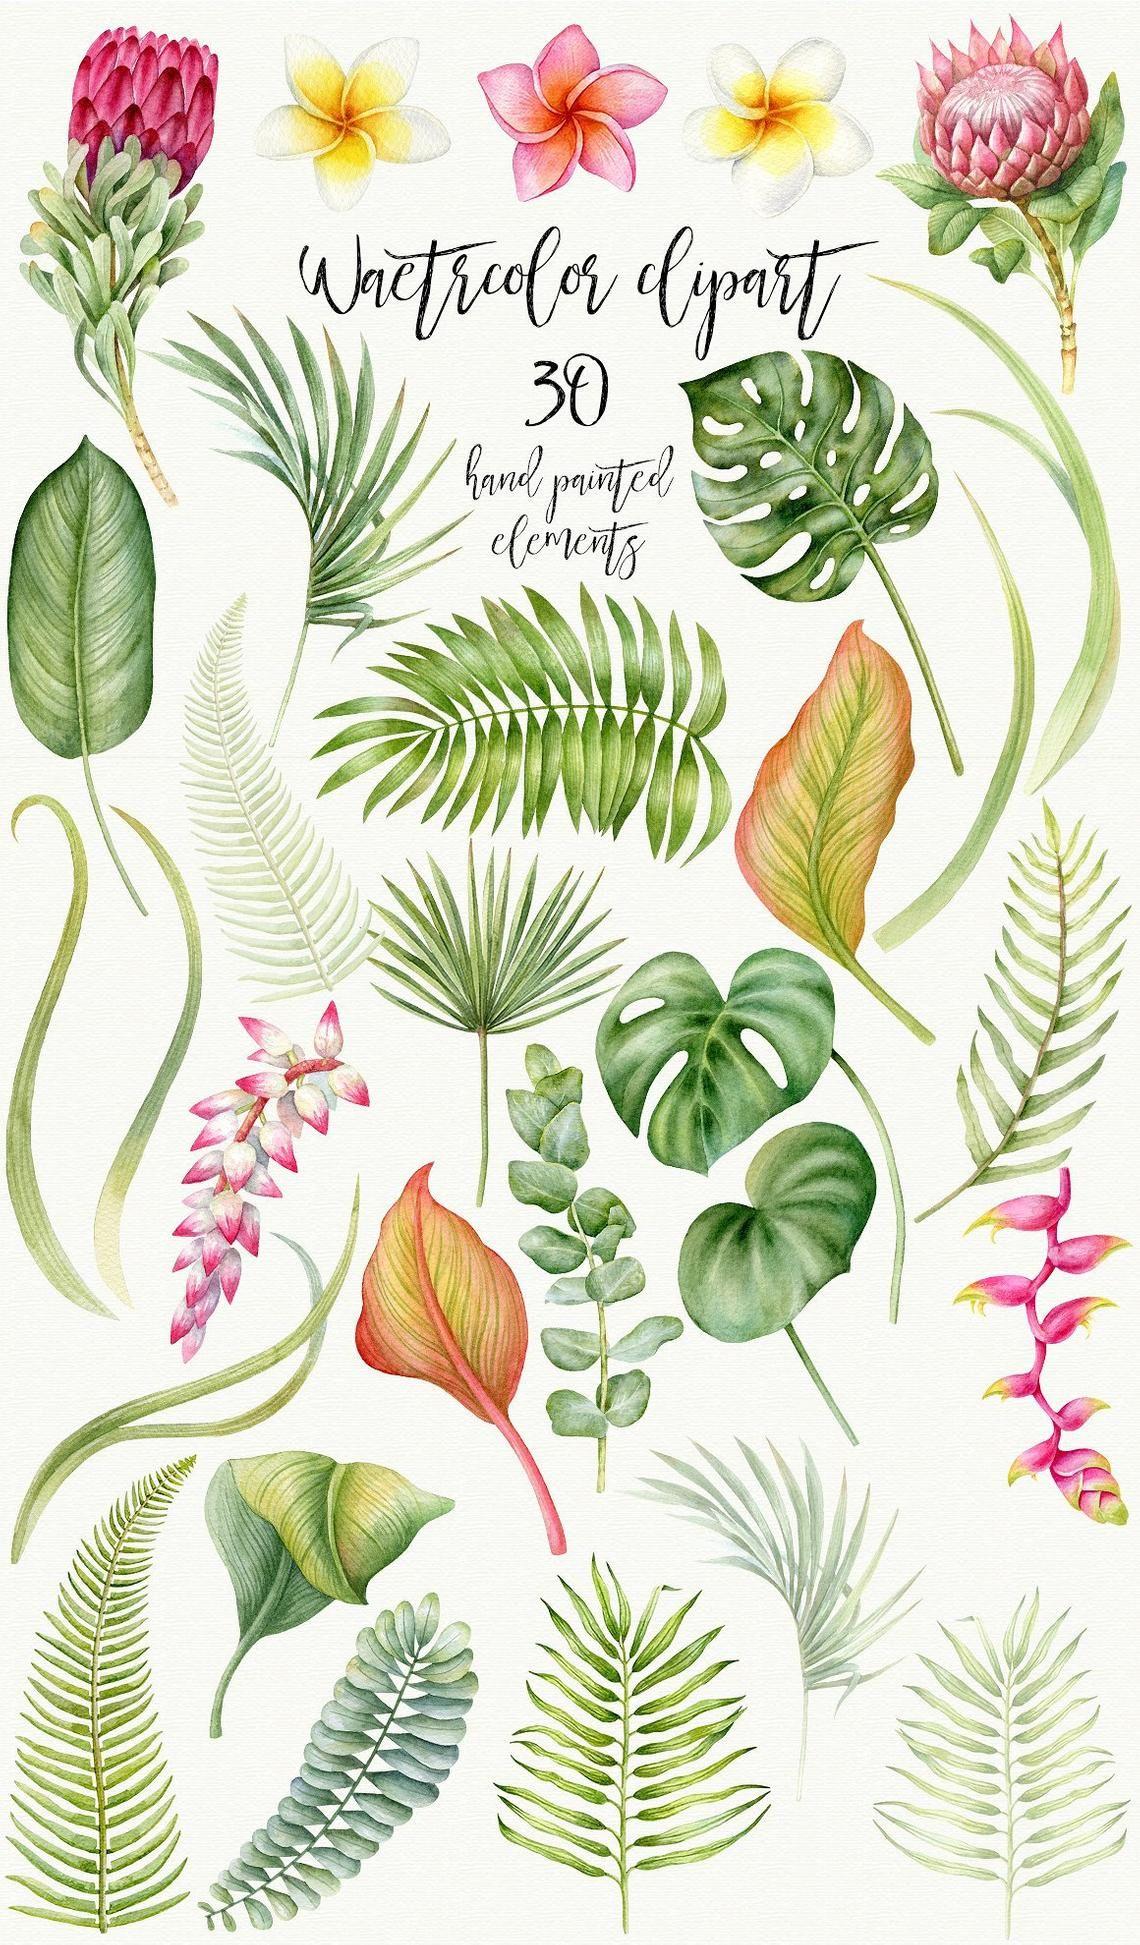 Watercolor Tropical Leaves Clip Art, Tropic, Protea, Palm Leaf, Plumeria, Hawaii clipart, Summer, Vacation, Eucalyptus -   17 tropical planting Art ideas